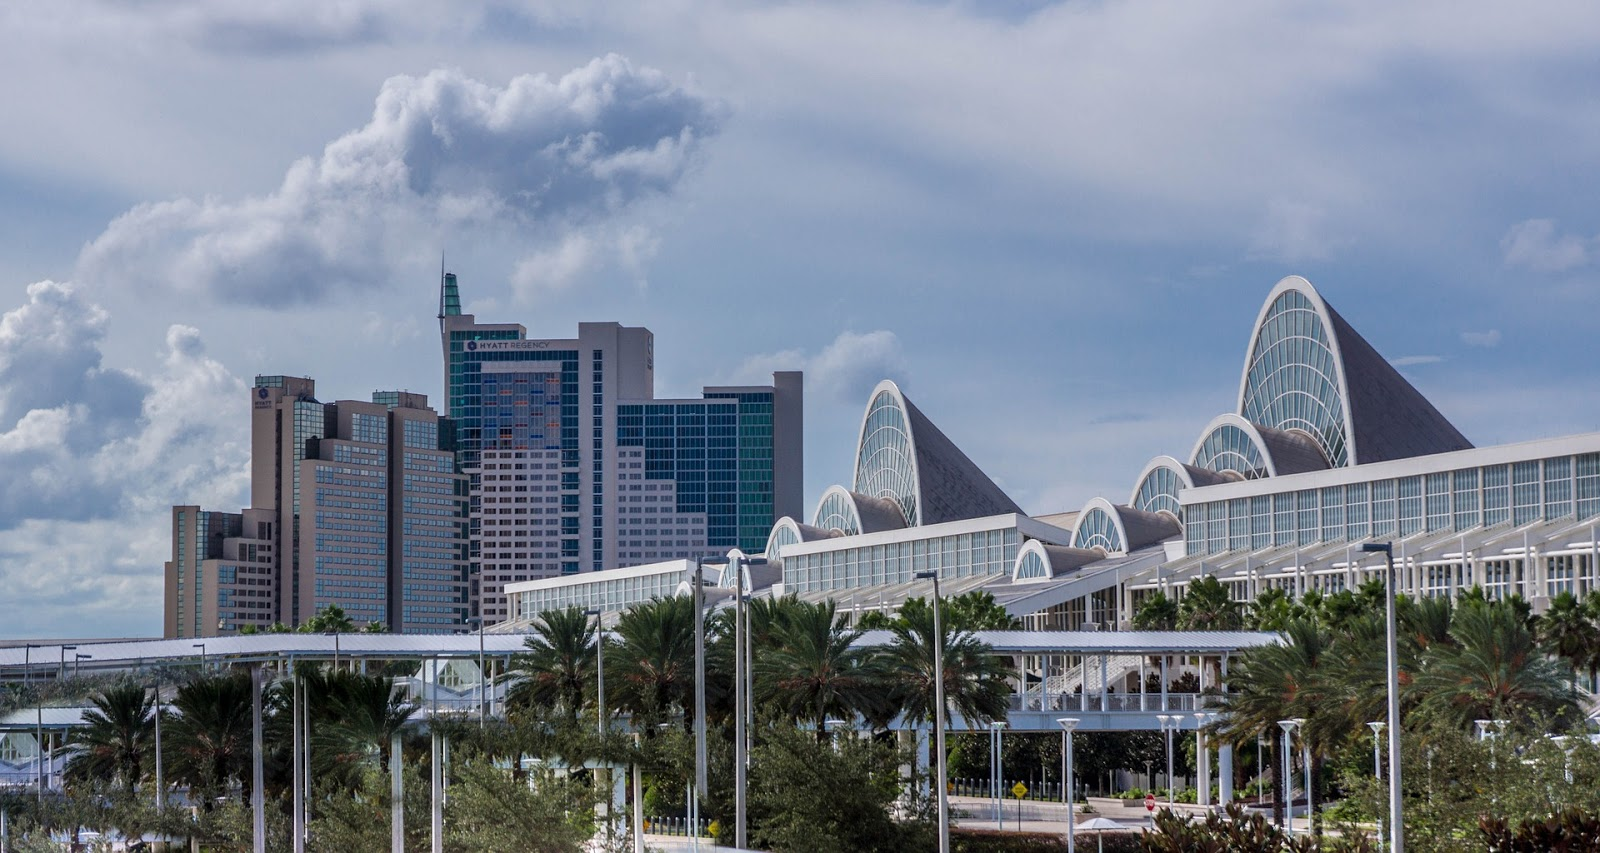 Visiting Orlando Florida